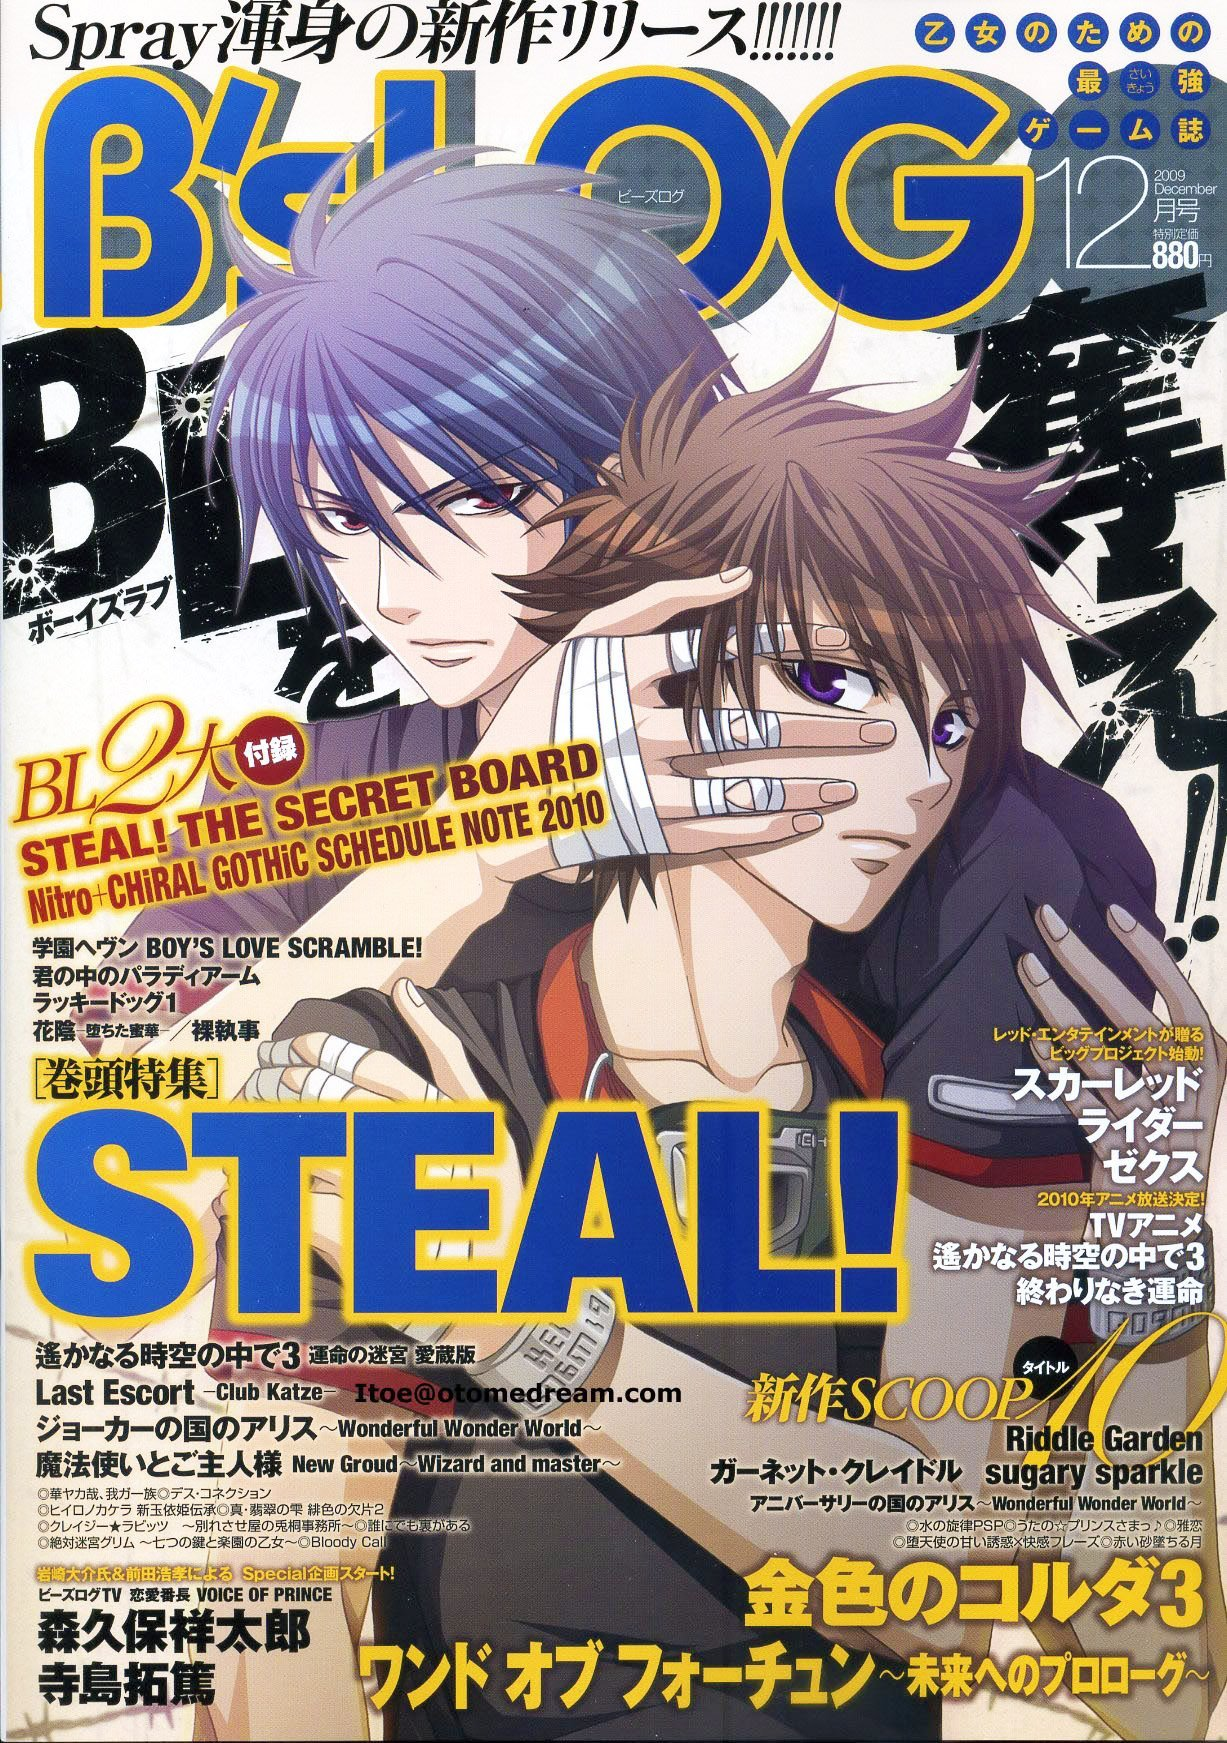 B's-LOG Issue 079 (December 2009)